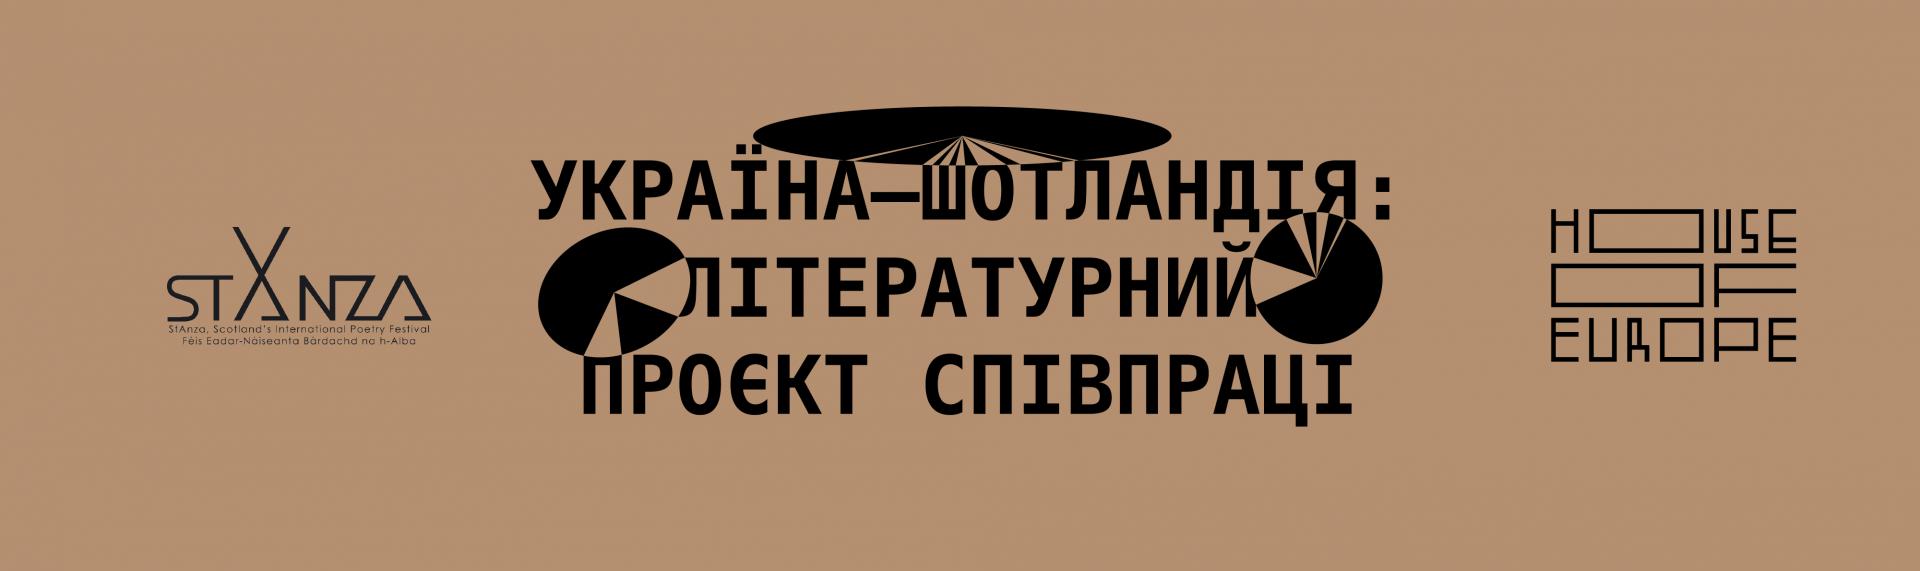 Ukraine-Scotland: Literary Cooperation Project